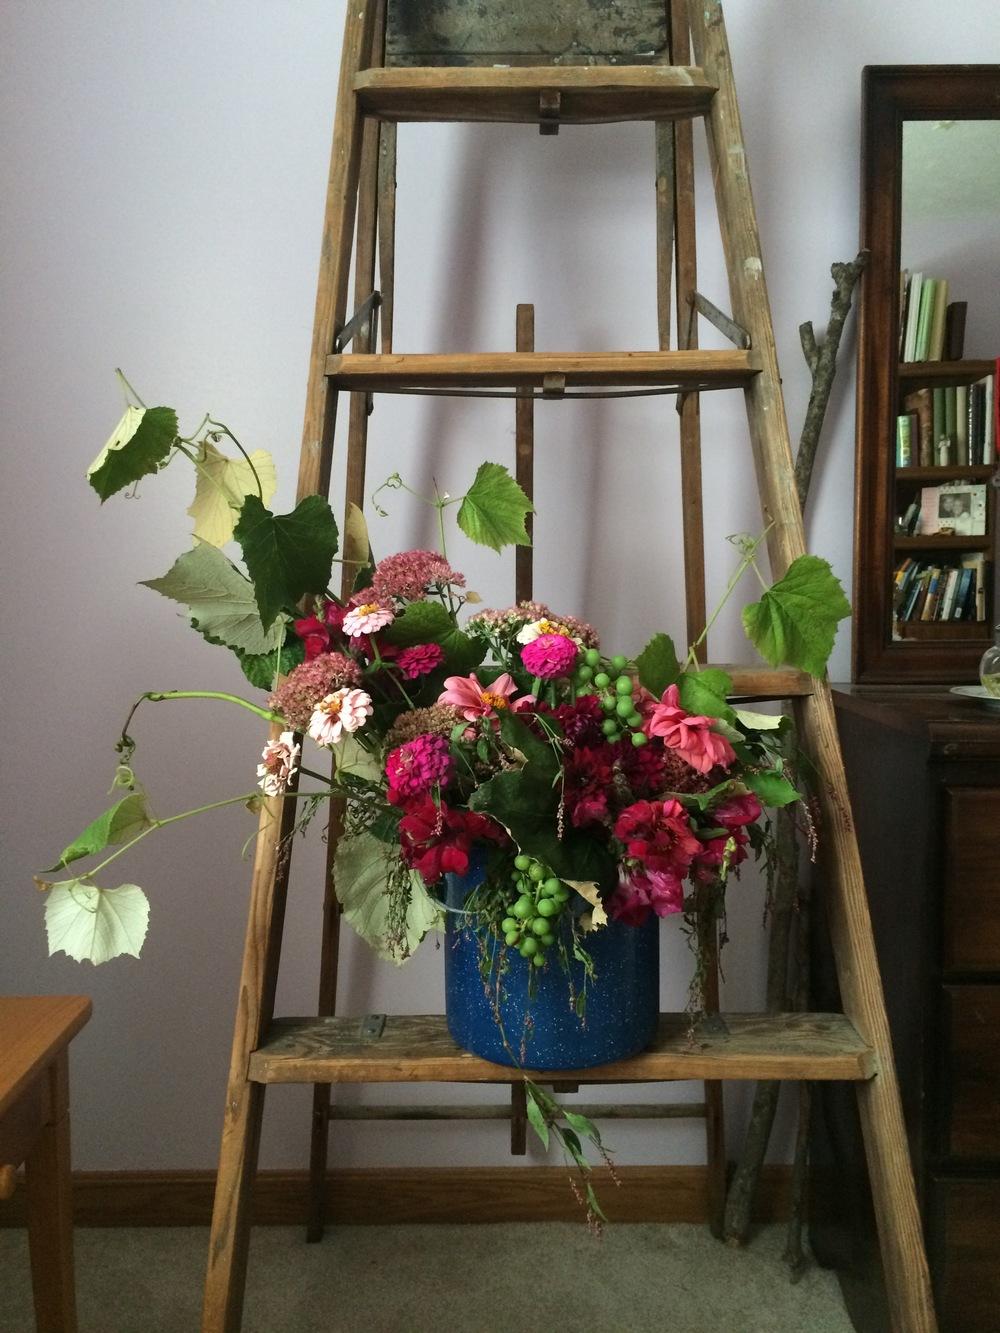 Bouquet - Grapevines, Sedum, Burgundy Snapdragons, Dalina Grande Castillo Dahlia, Dahlia (pinkish orange flower), zinnia, smartweed.